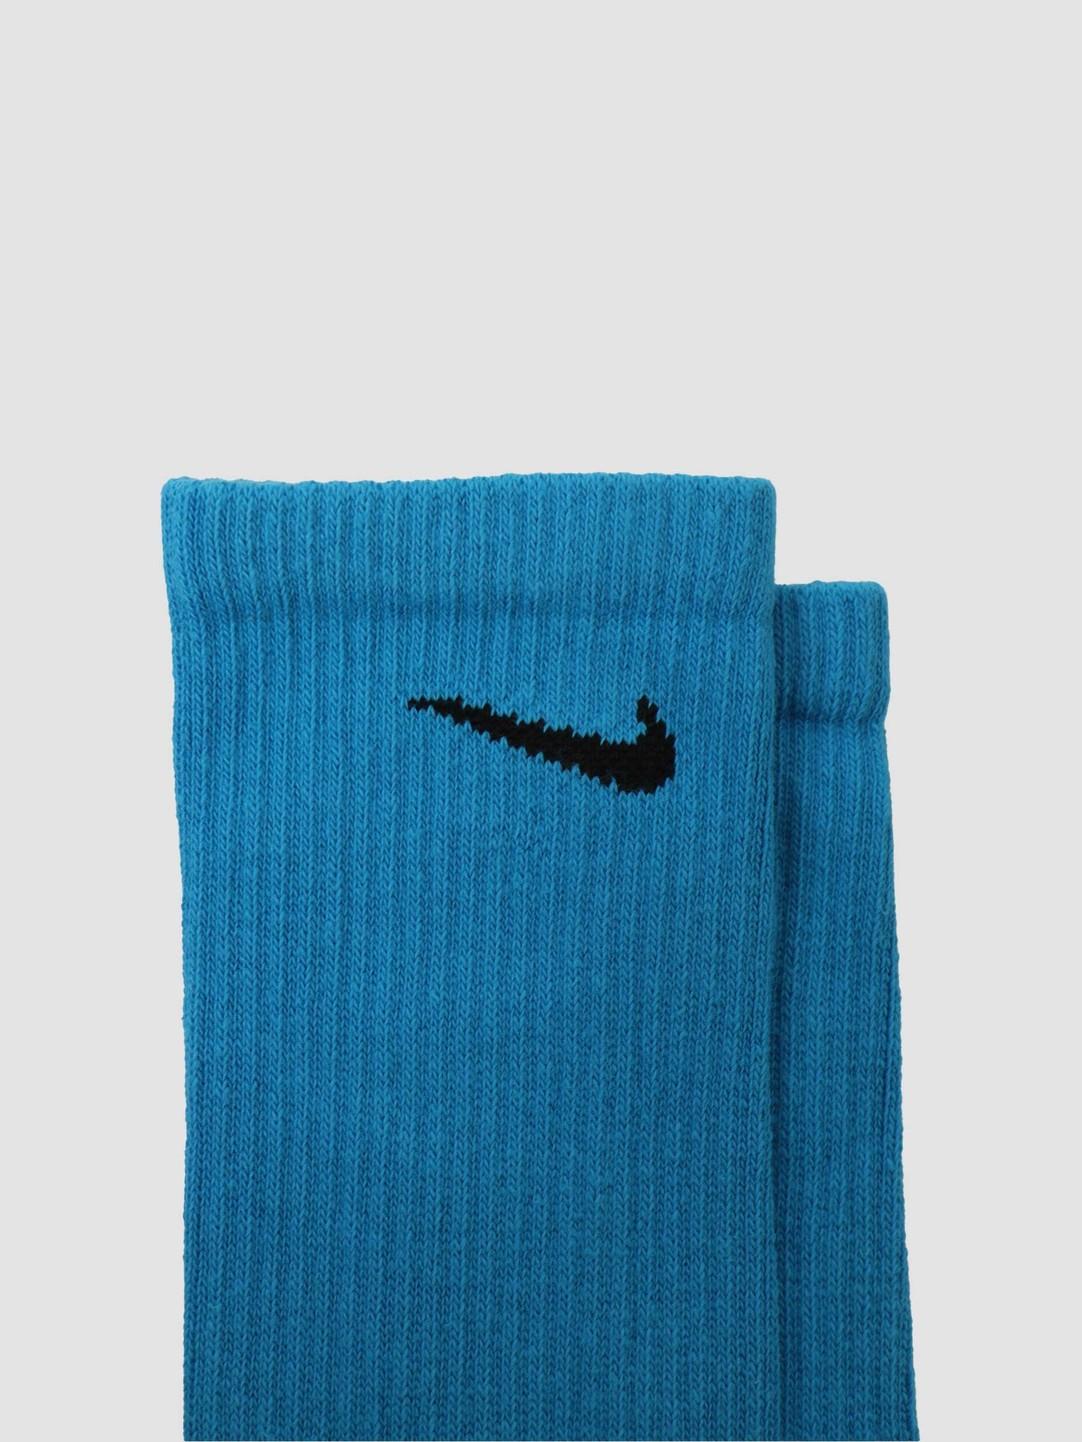 Nike Nike Every Plus Cush Crew 3PR Multi Color SX6888-903